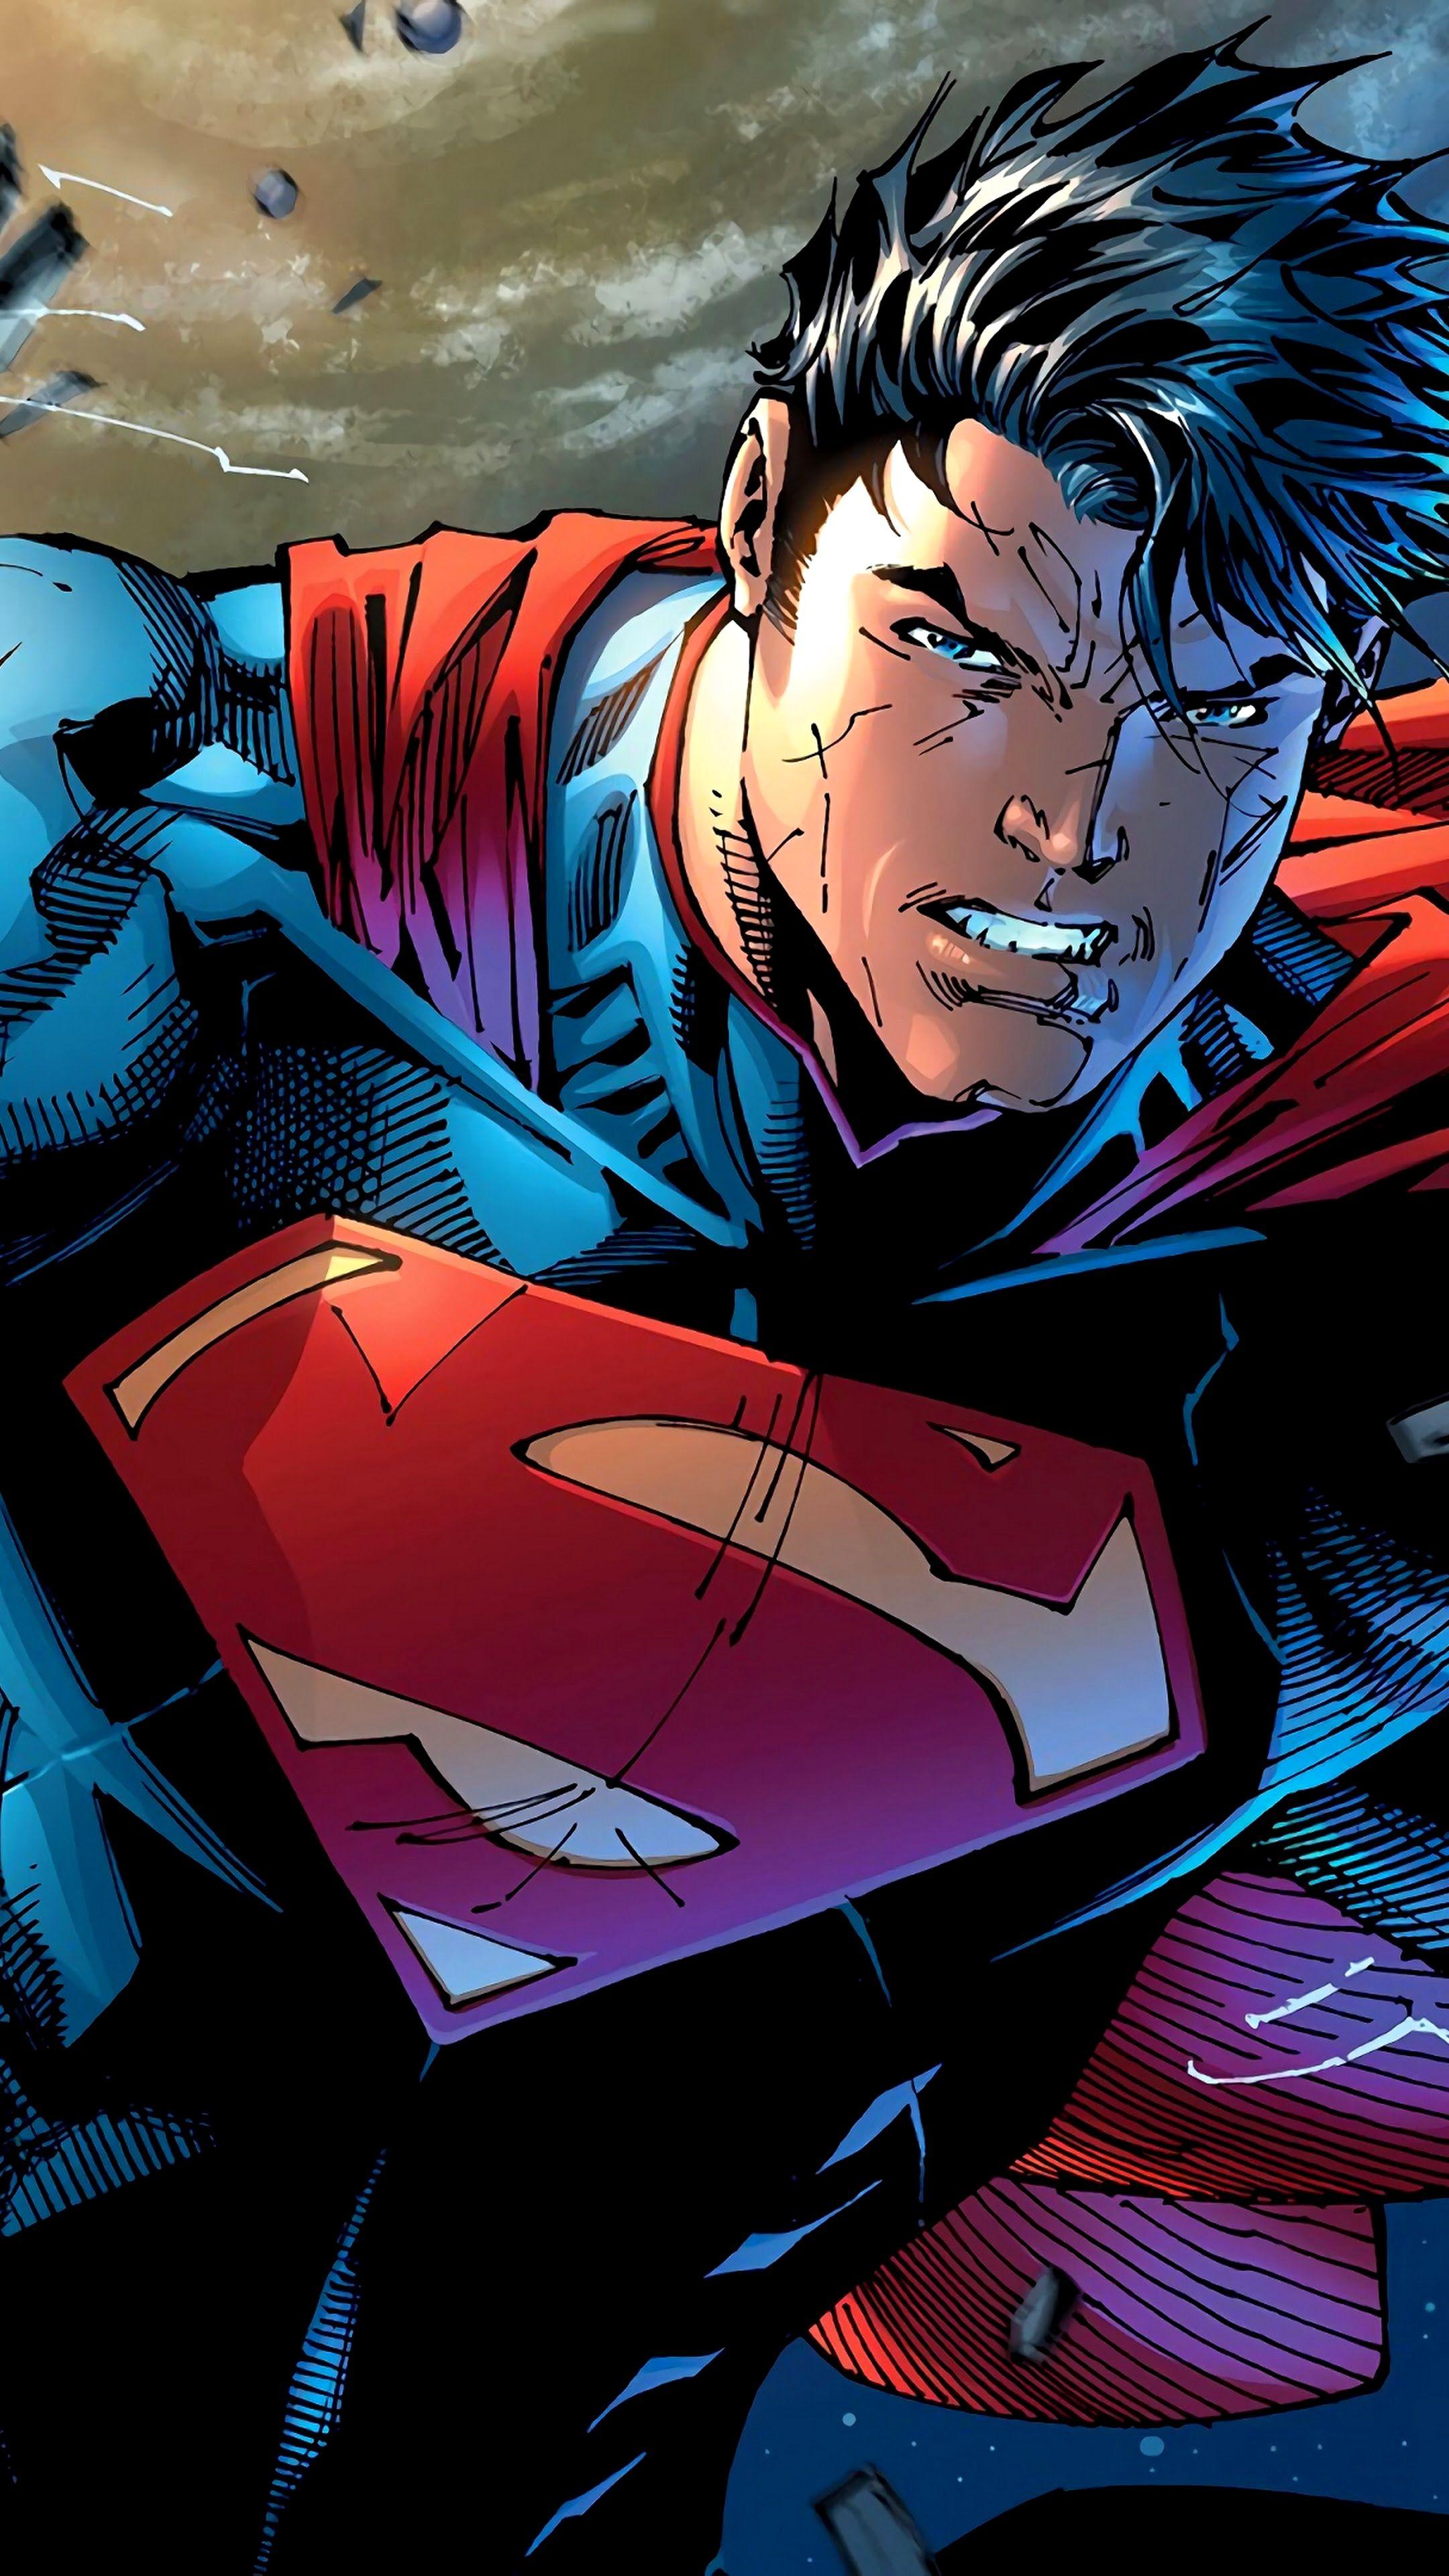 Superman Wallpaper 4k Iphone Trick In 2020 Superman Wallpaper Superman Comic Superman Art